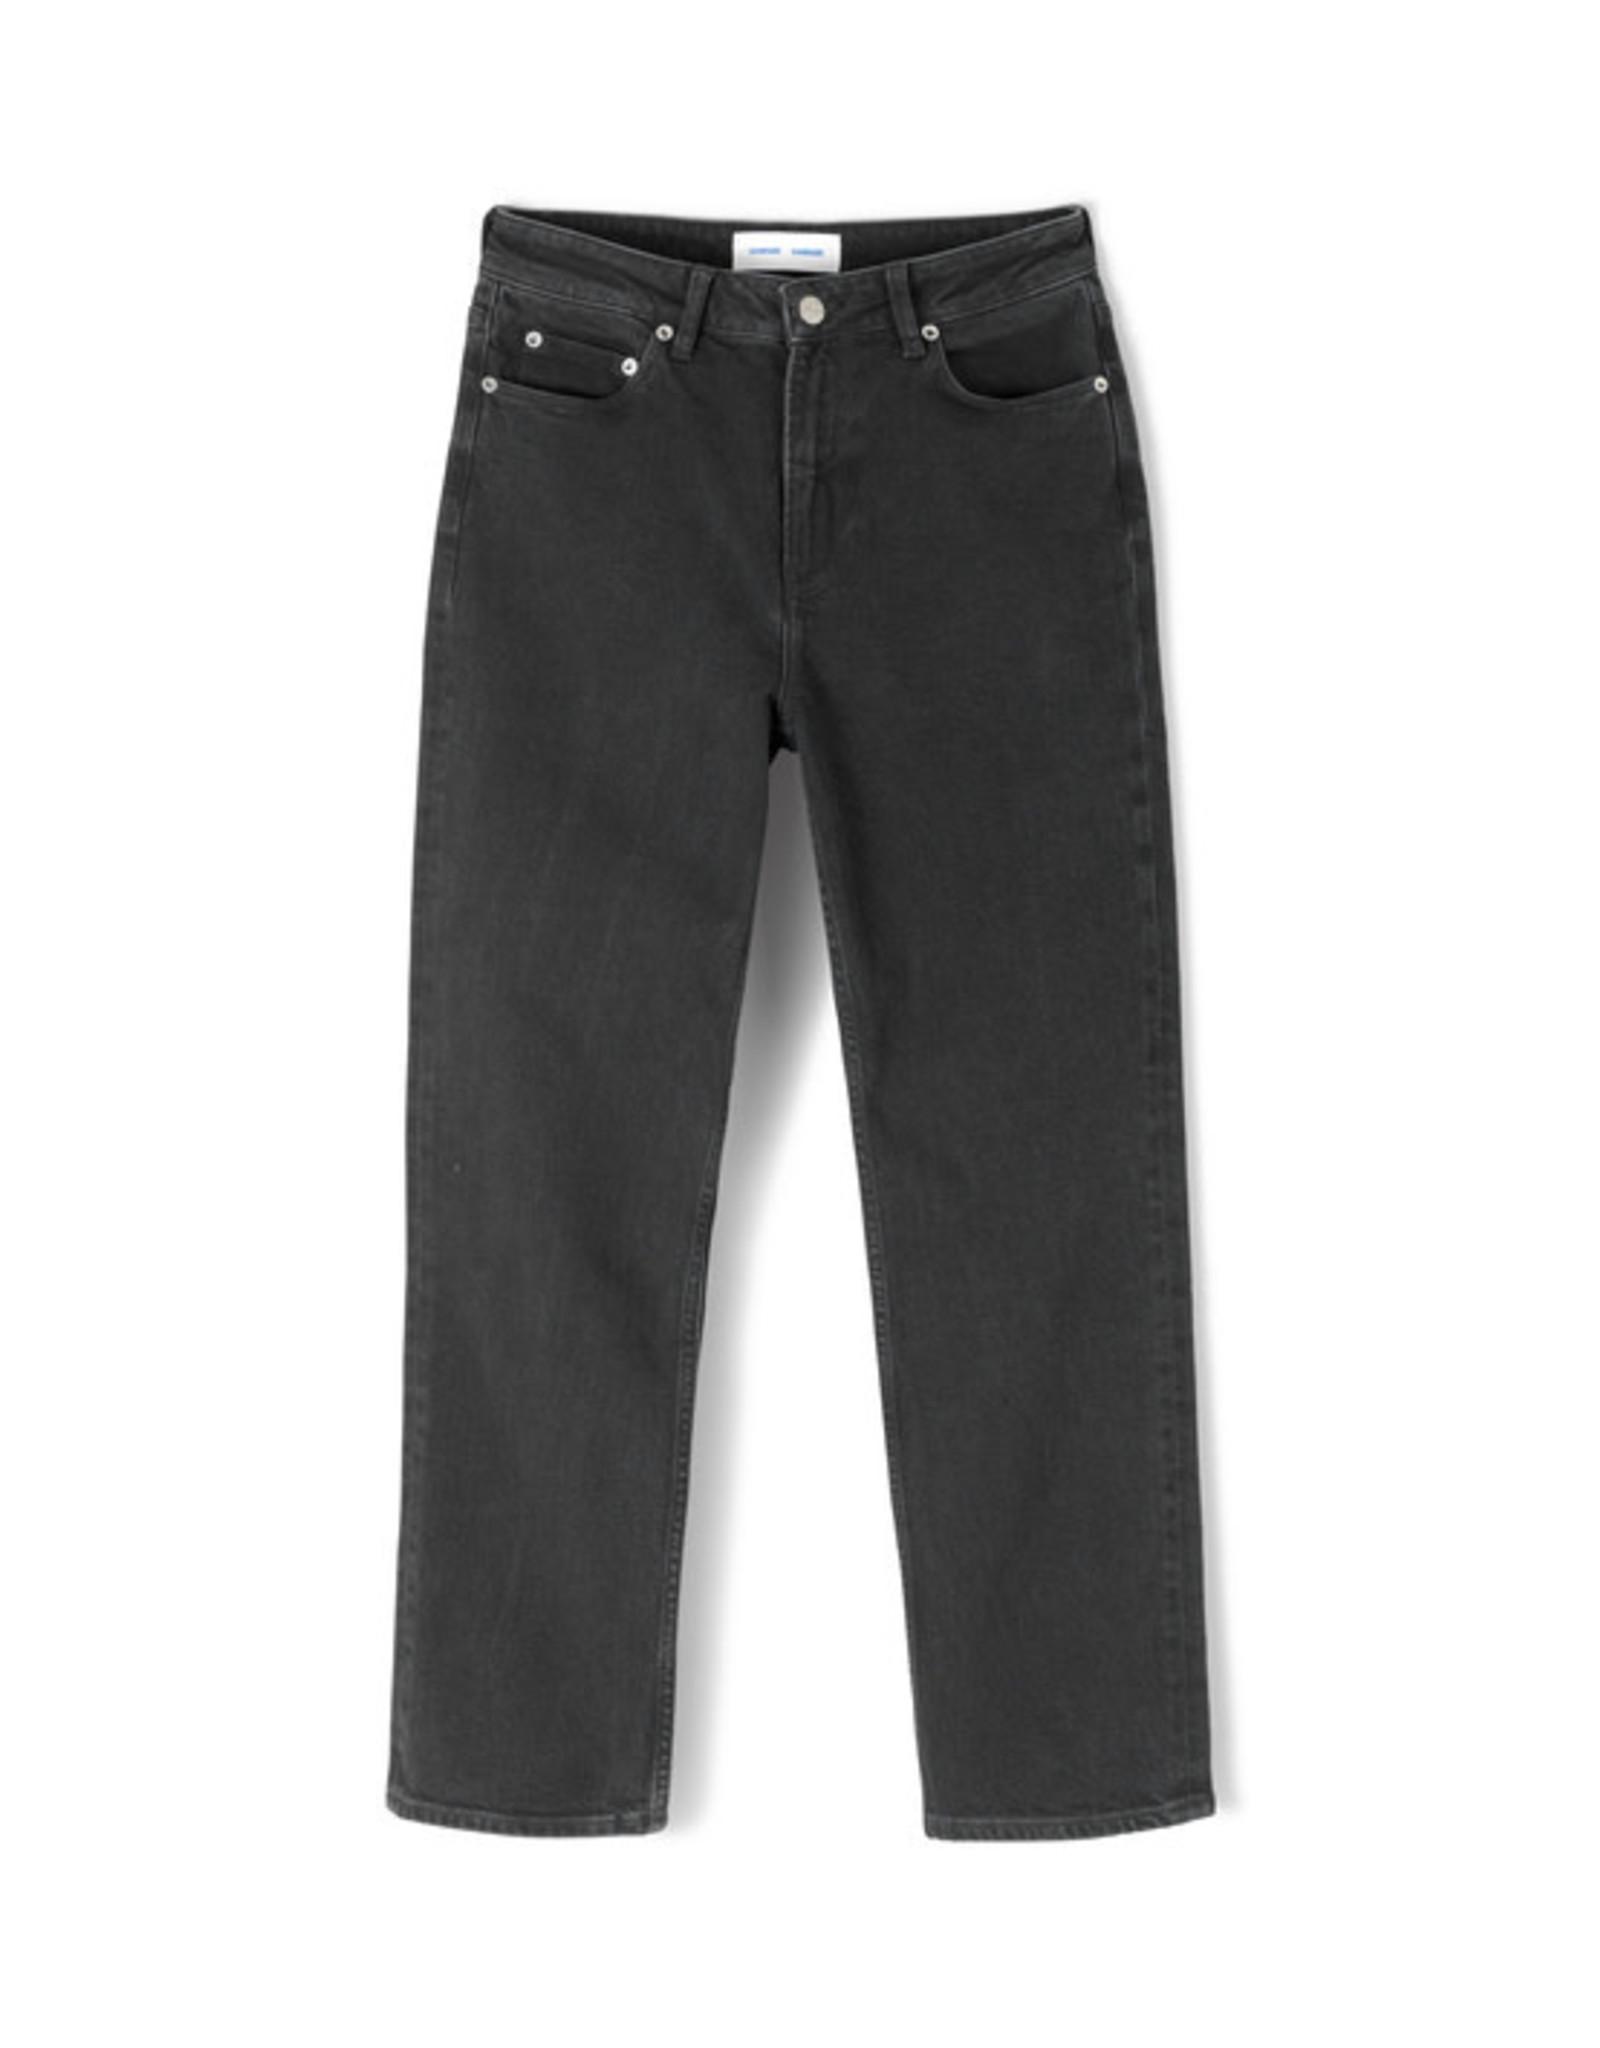 Samsoe & Samsoe Marianne jeans 11356